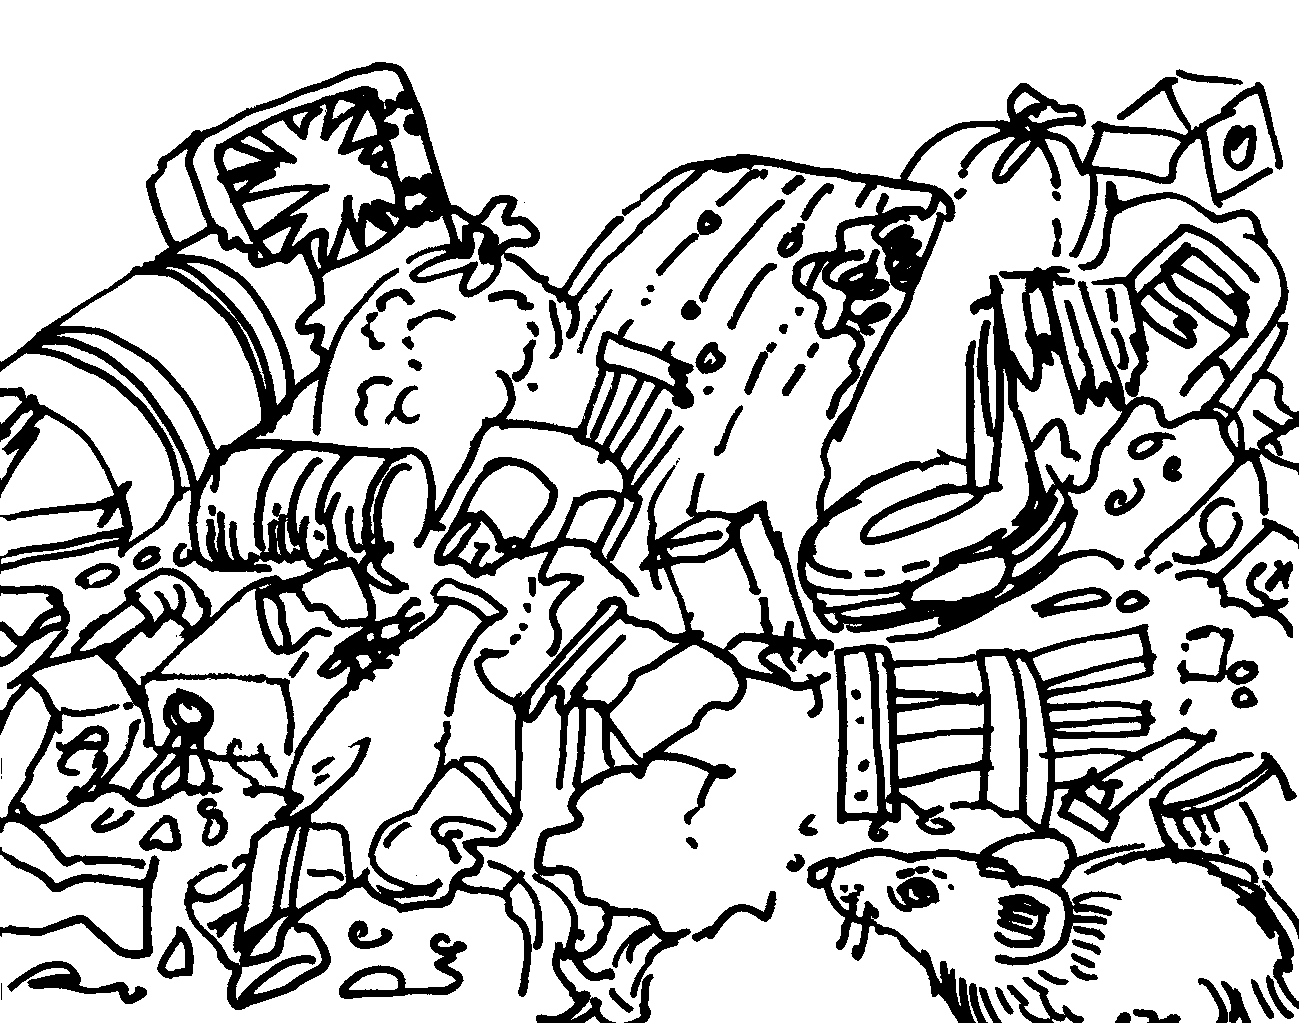 Shovel Coloring Page - GetColoringPages.com | 1023x1299